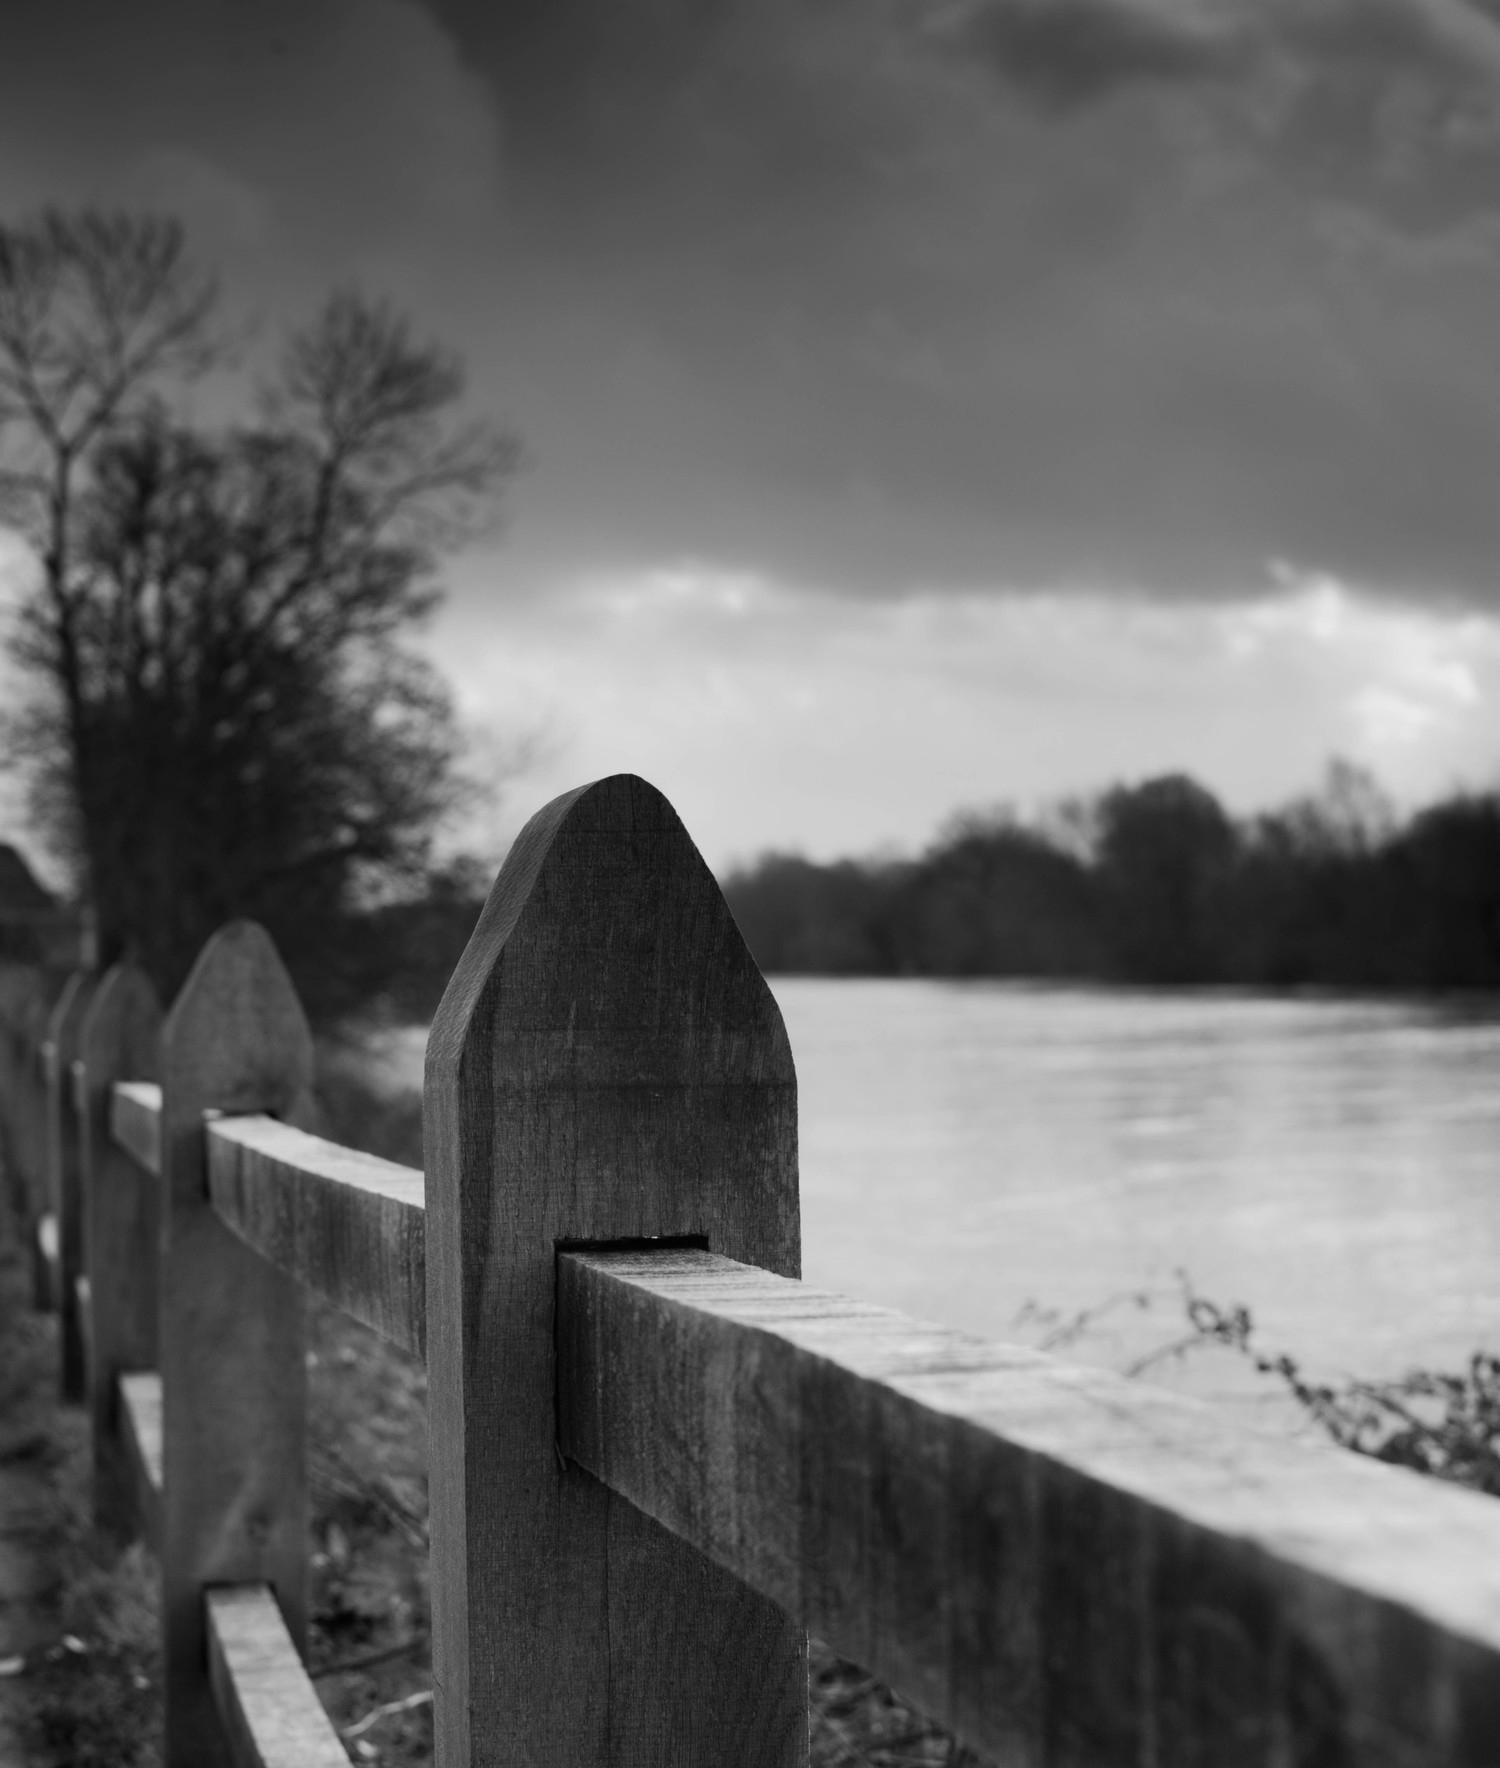 River Thames by Hampton Court